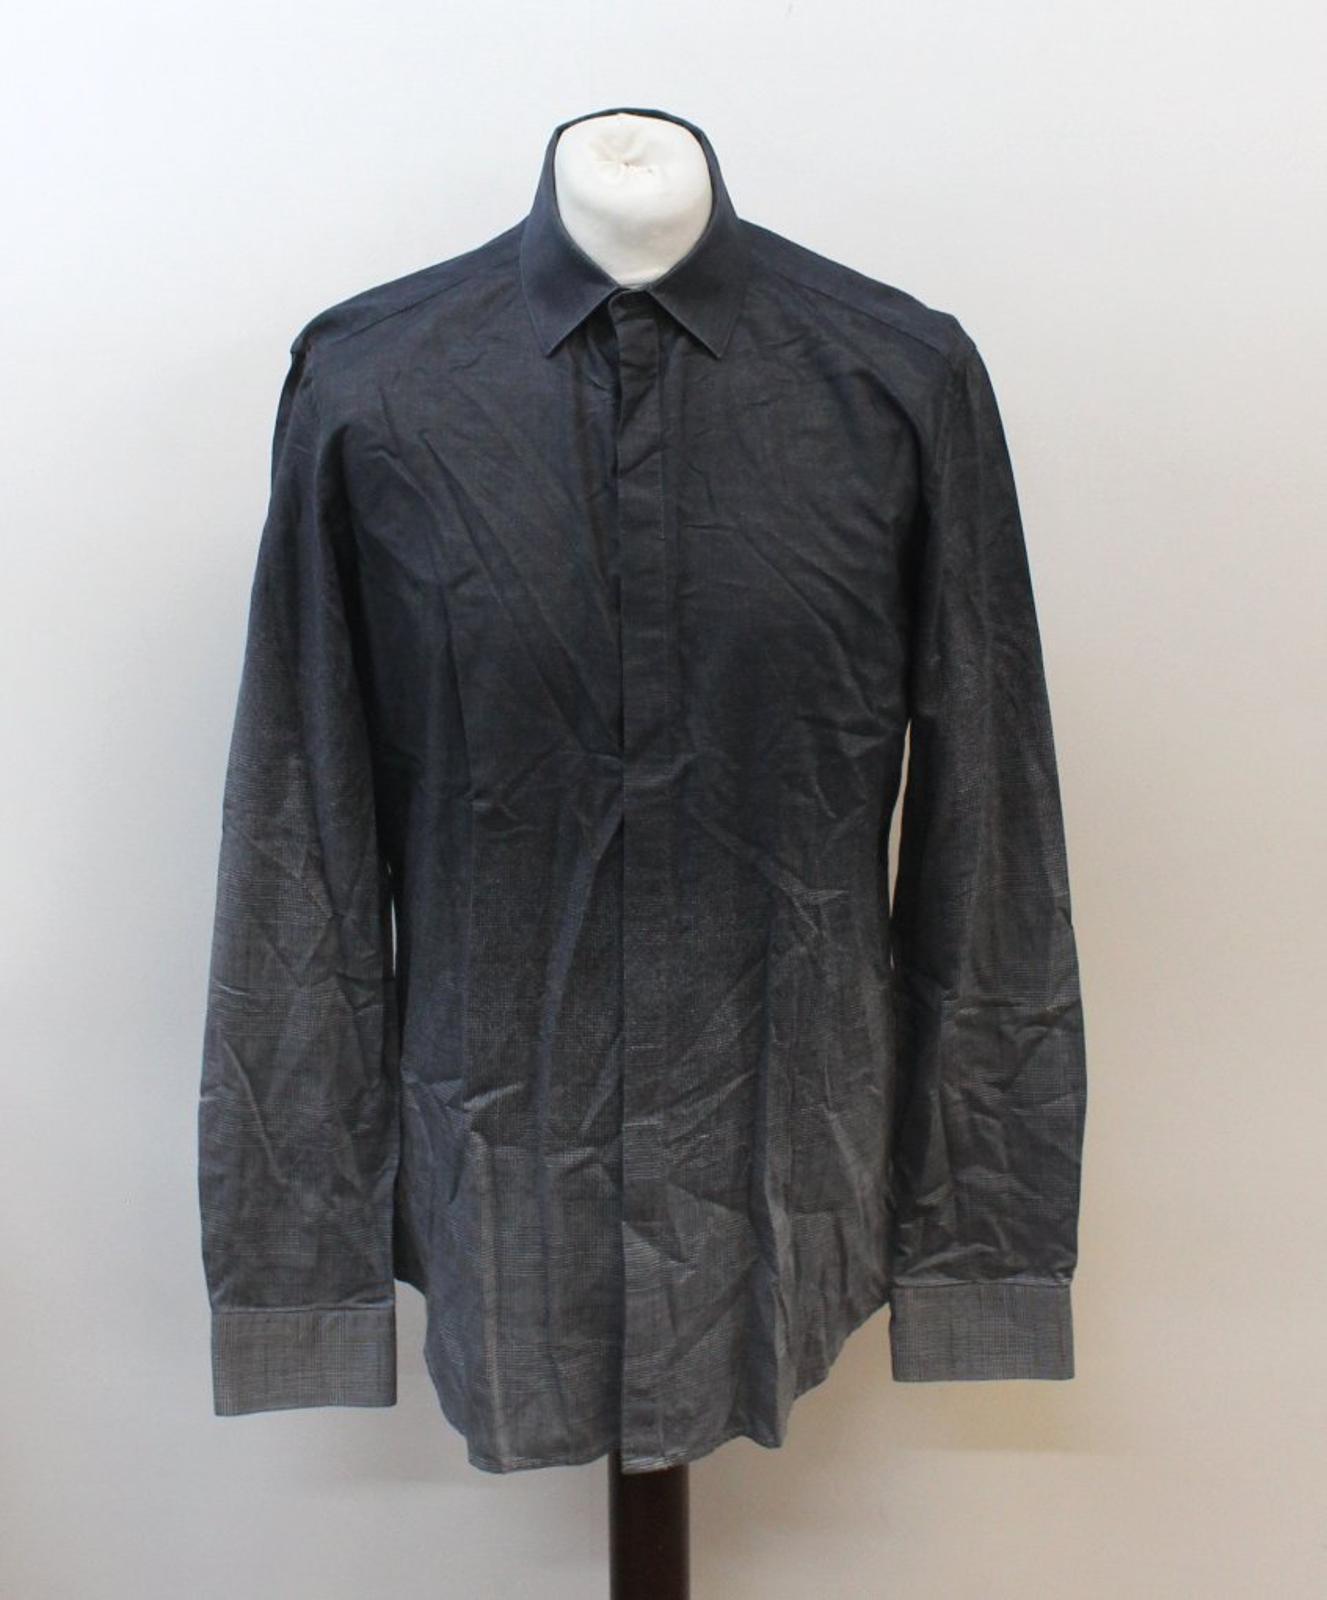 Neil-Barrett-Hombre-Luz-Gris-Oscuro-Algodon-Slim-Fit-Camisa-Cuello-Ombre-16-5-034-42cm miniatura 10